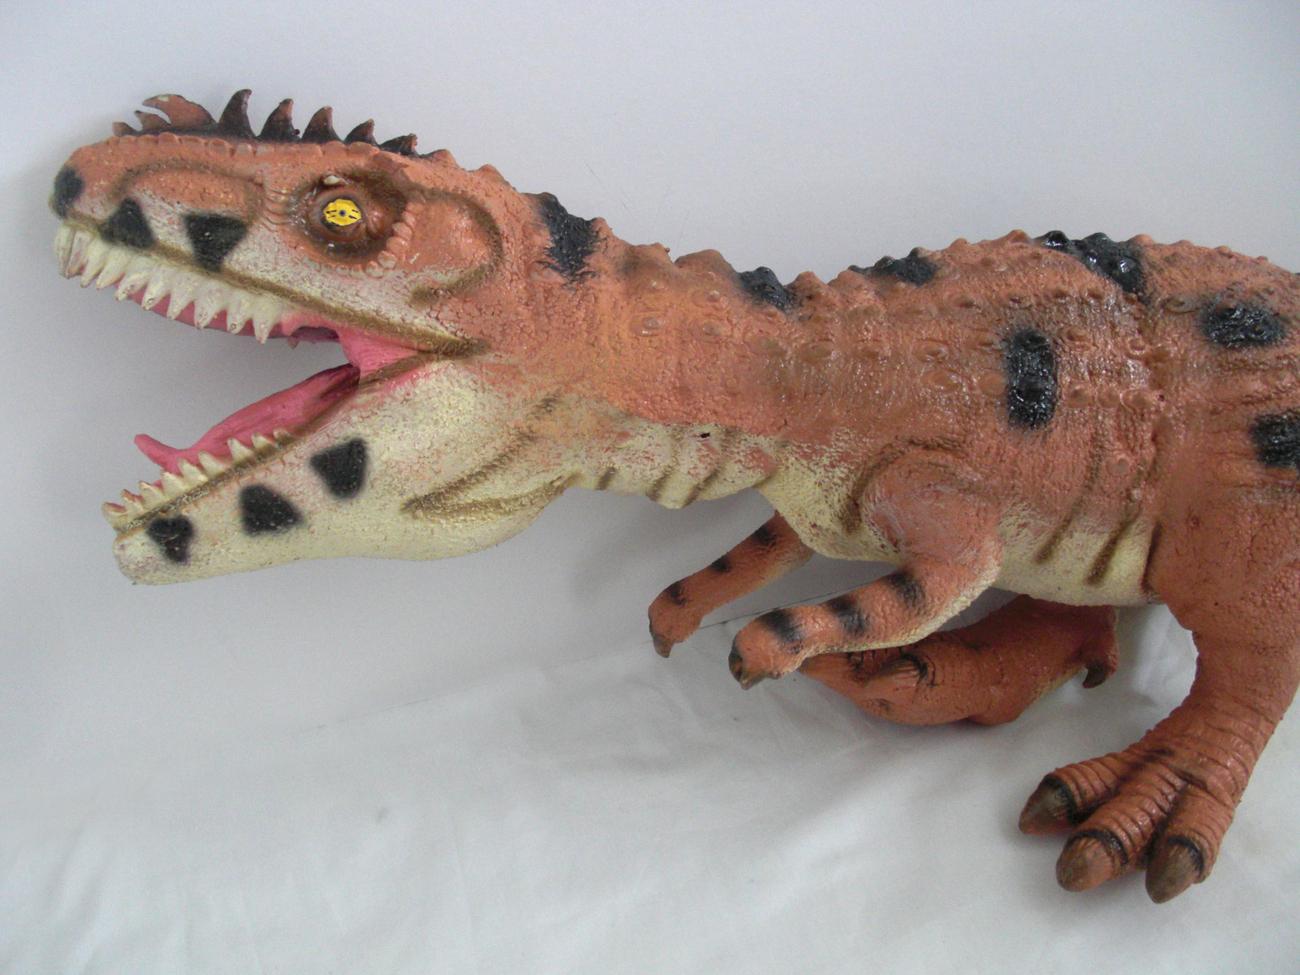 Disney Dinosaur Toys : Disney s dinosaur toys related keywords